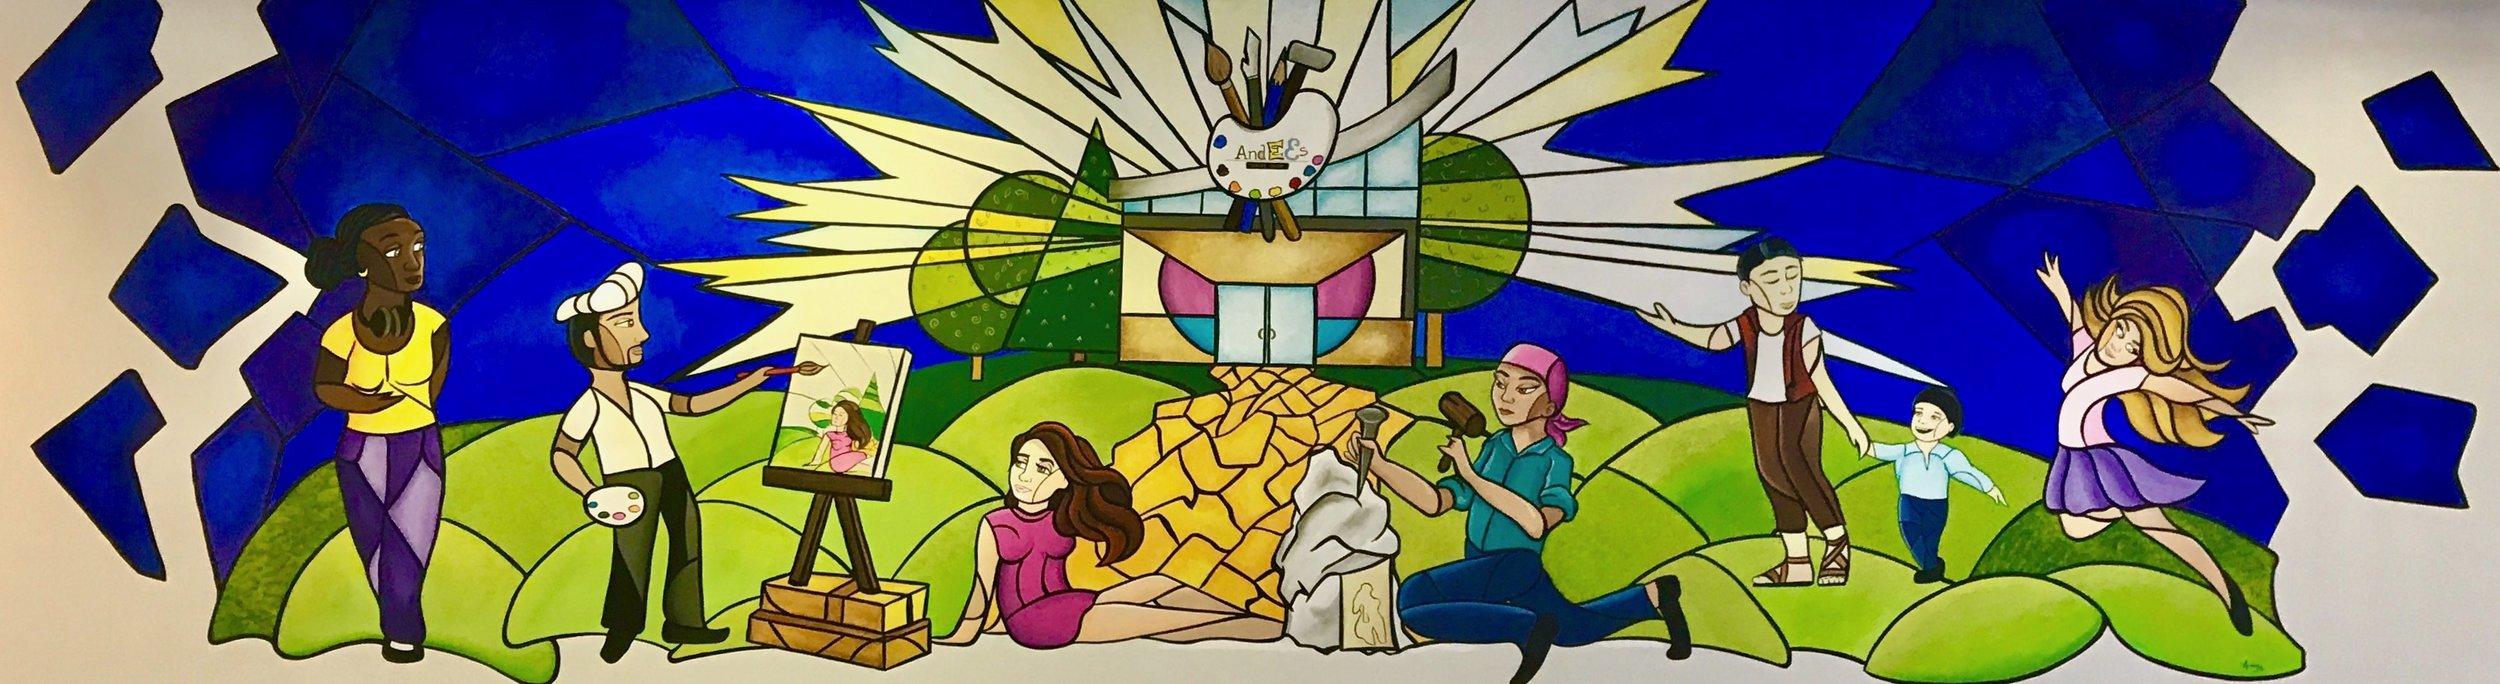 Mural by Alfredo Majuri Vargas